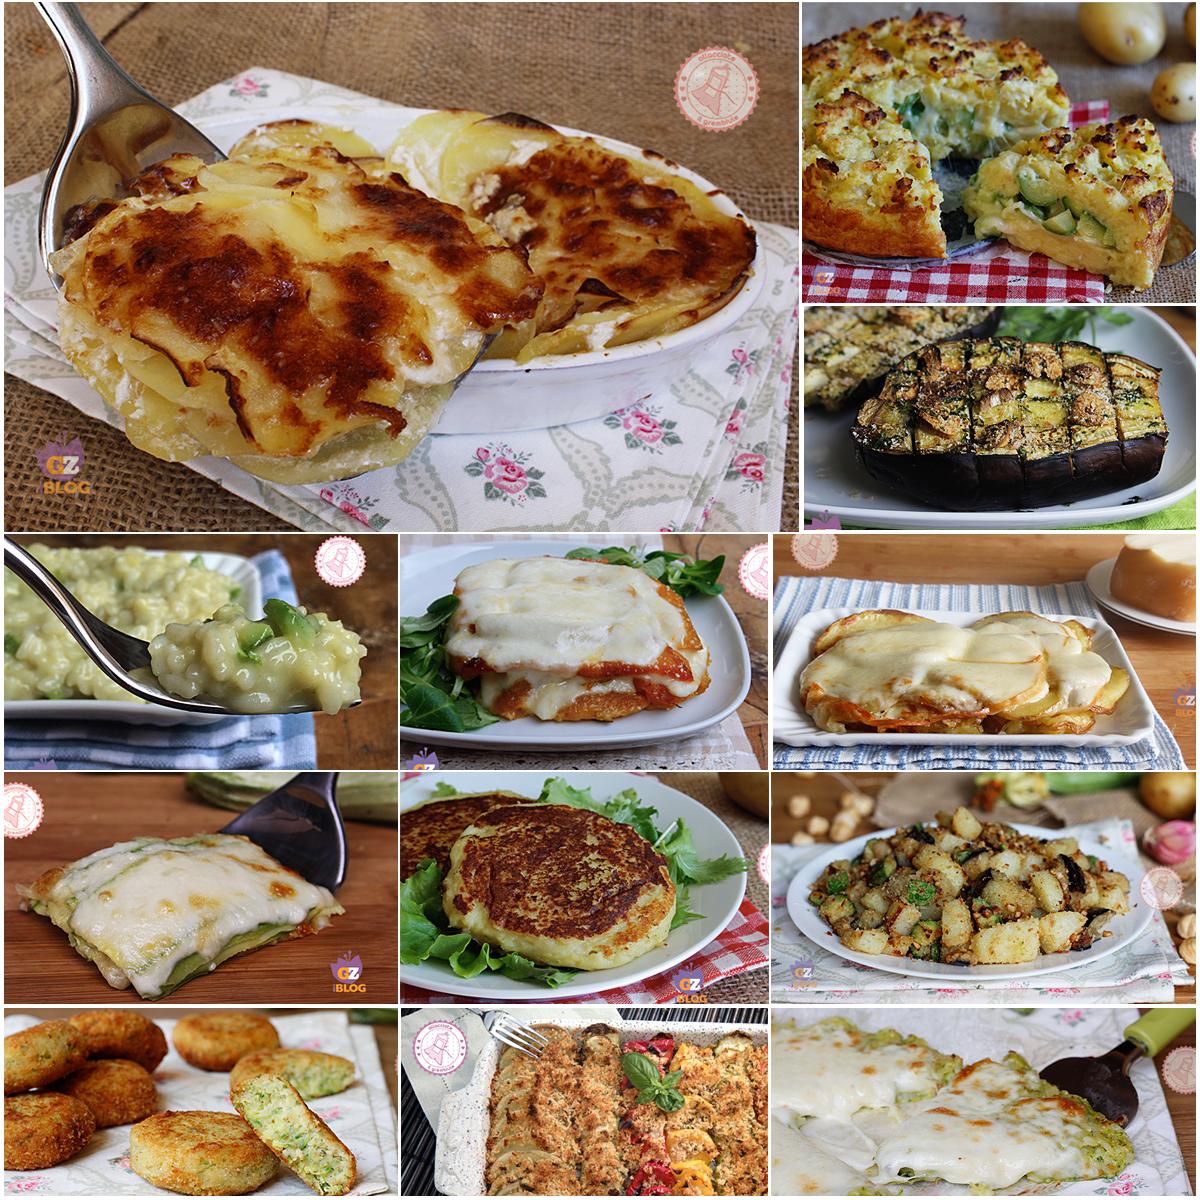 Ricette con le verdure ricette senza carne facili gustose for Ricette con verdure